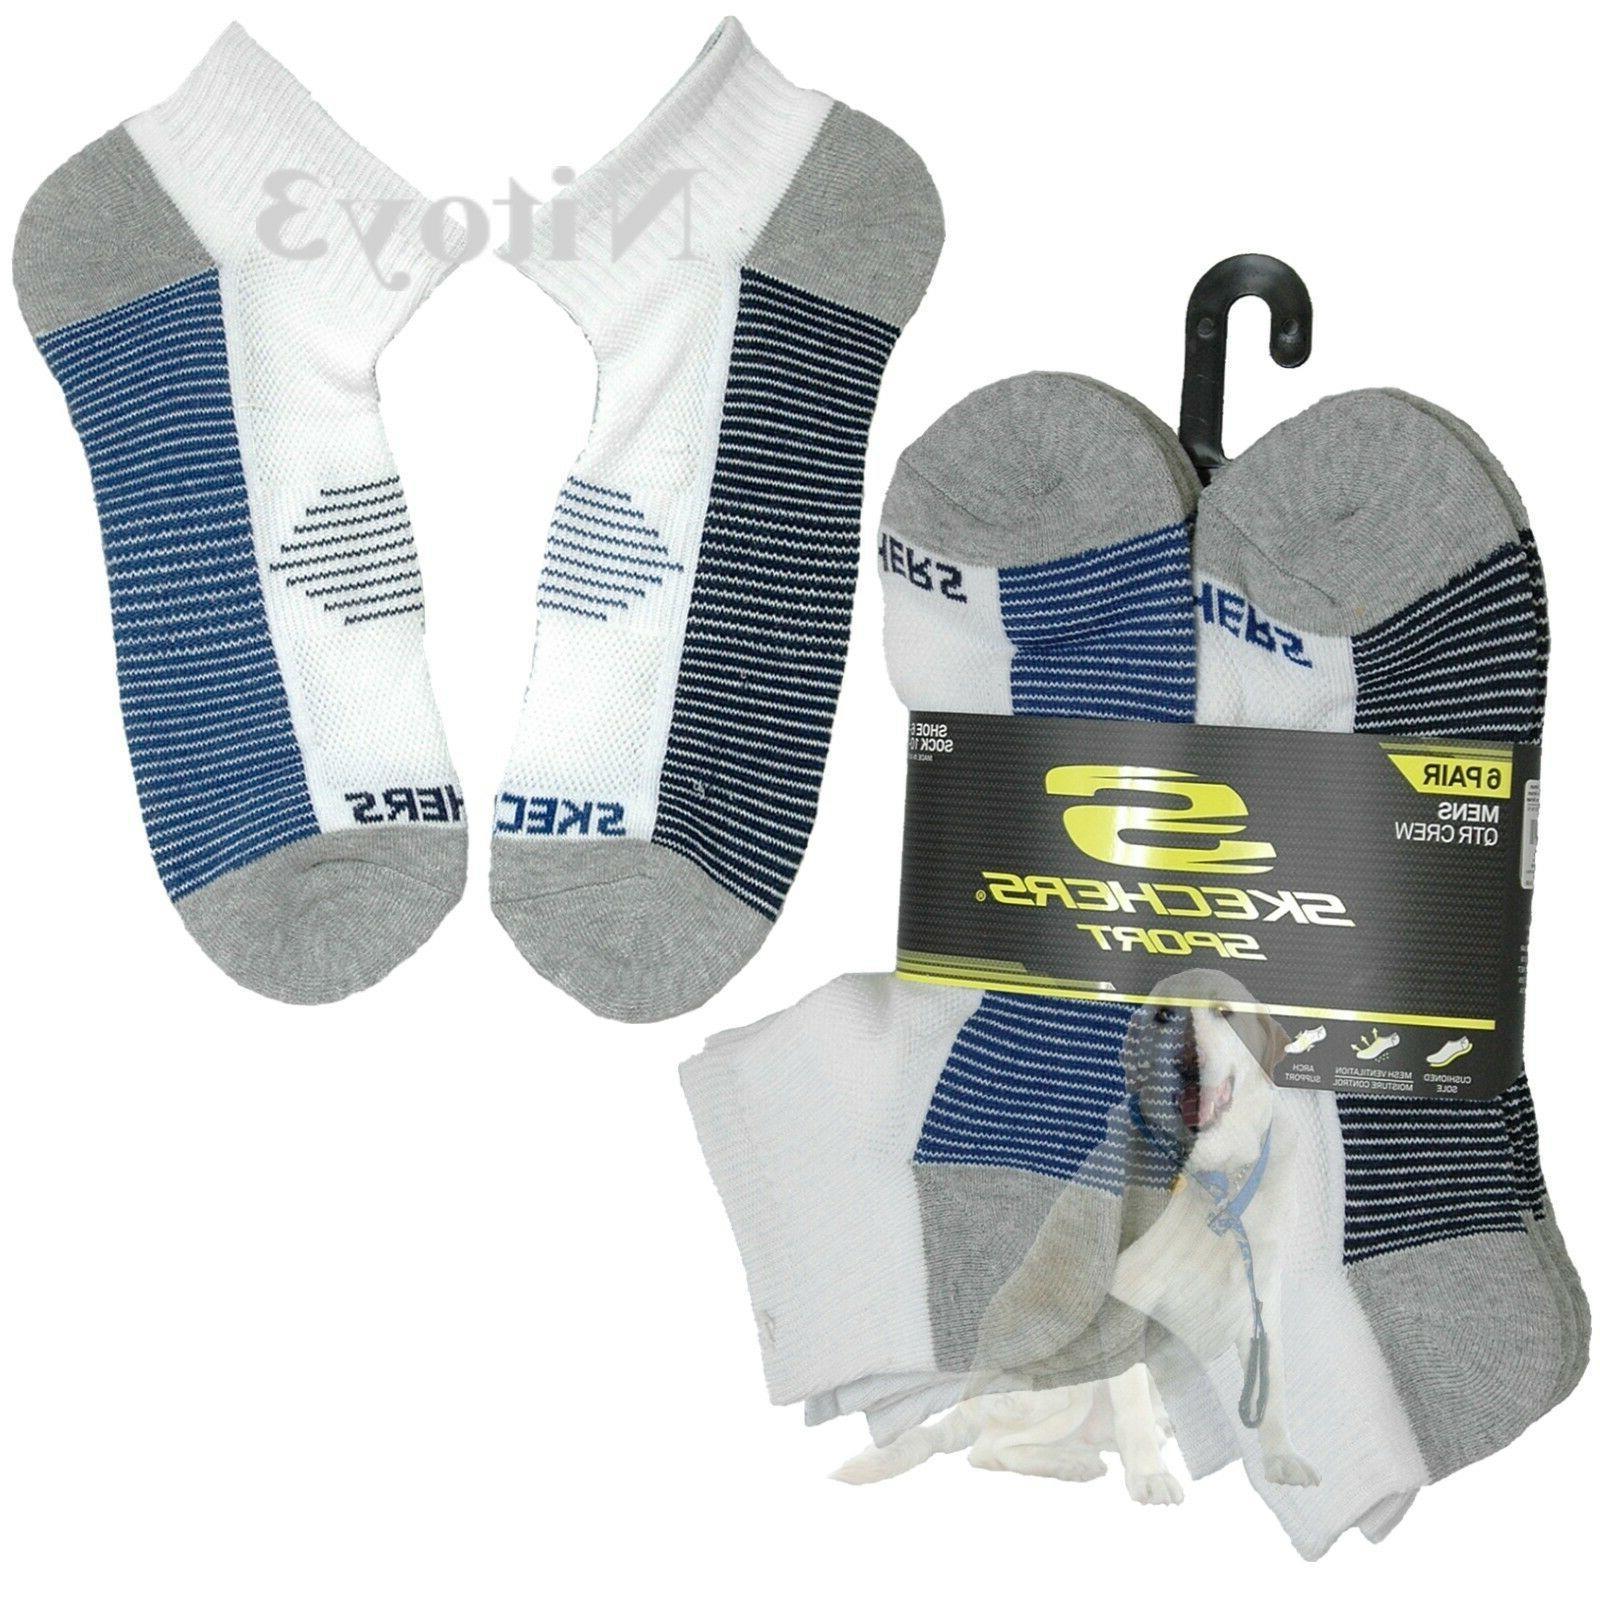 Skechers Sport Terry Ankle Socks - 6-Pack Men One Size : 6-1